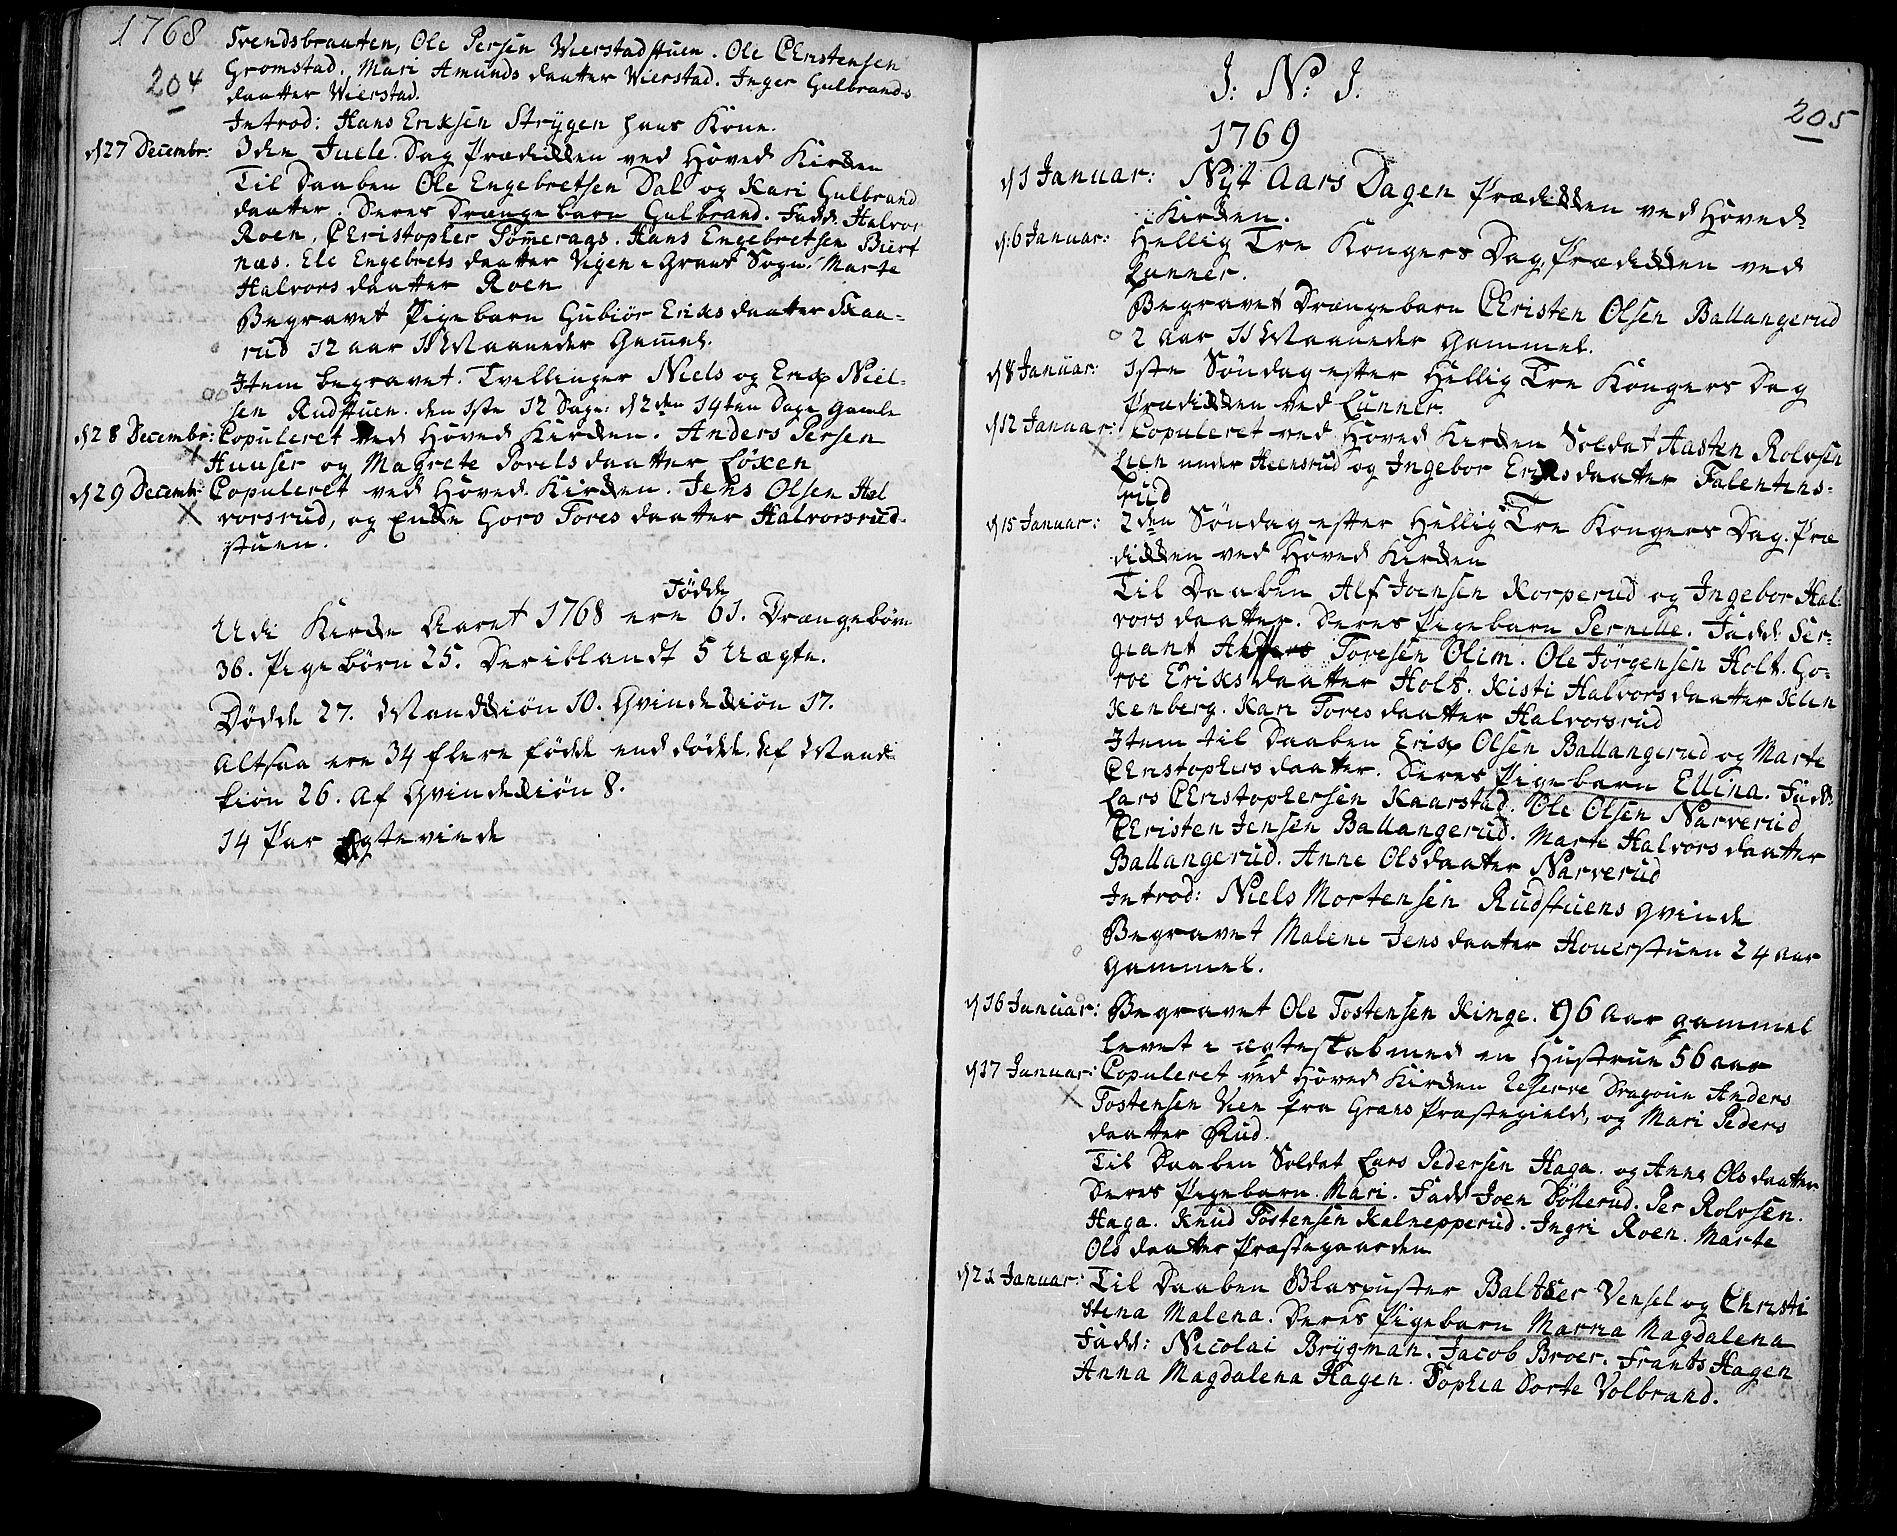 SAH, Jevnaker prestekontor, Ministerialbok nr. 3, 1752-1799, s. 204-205